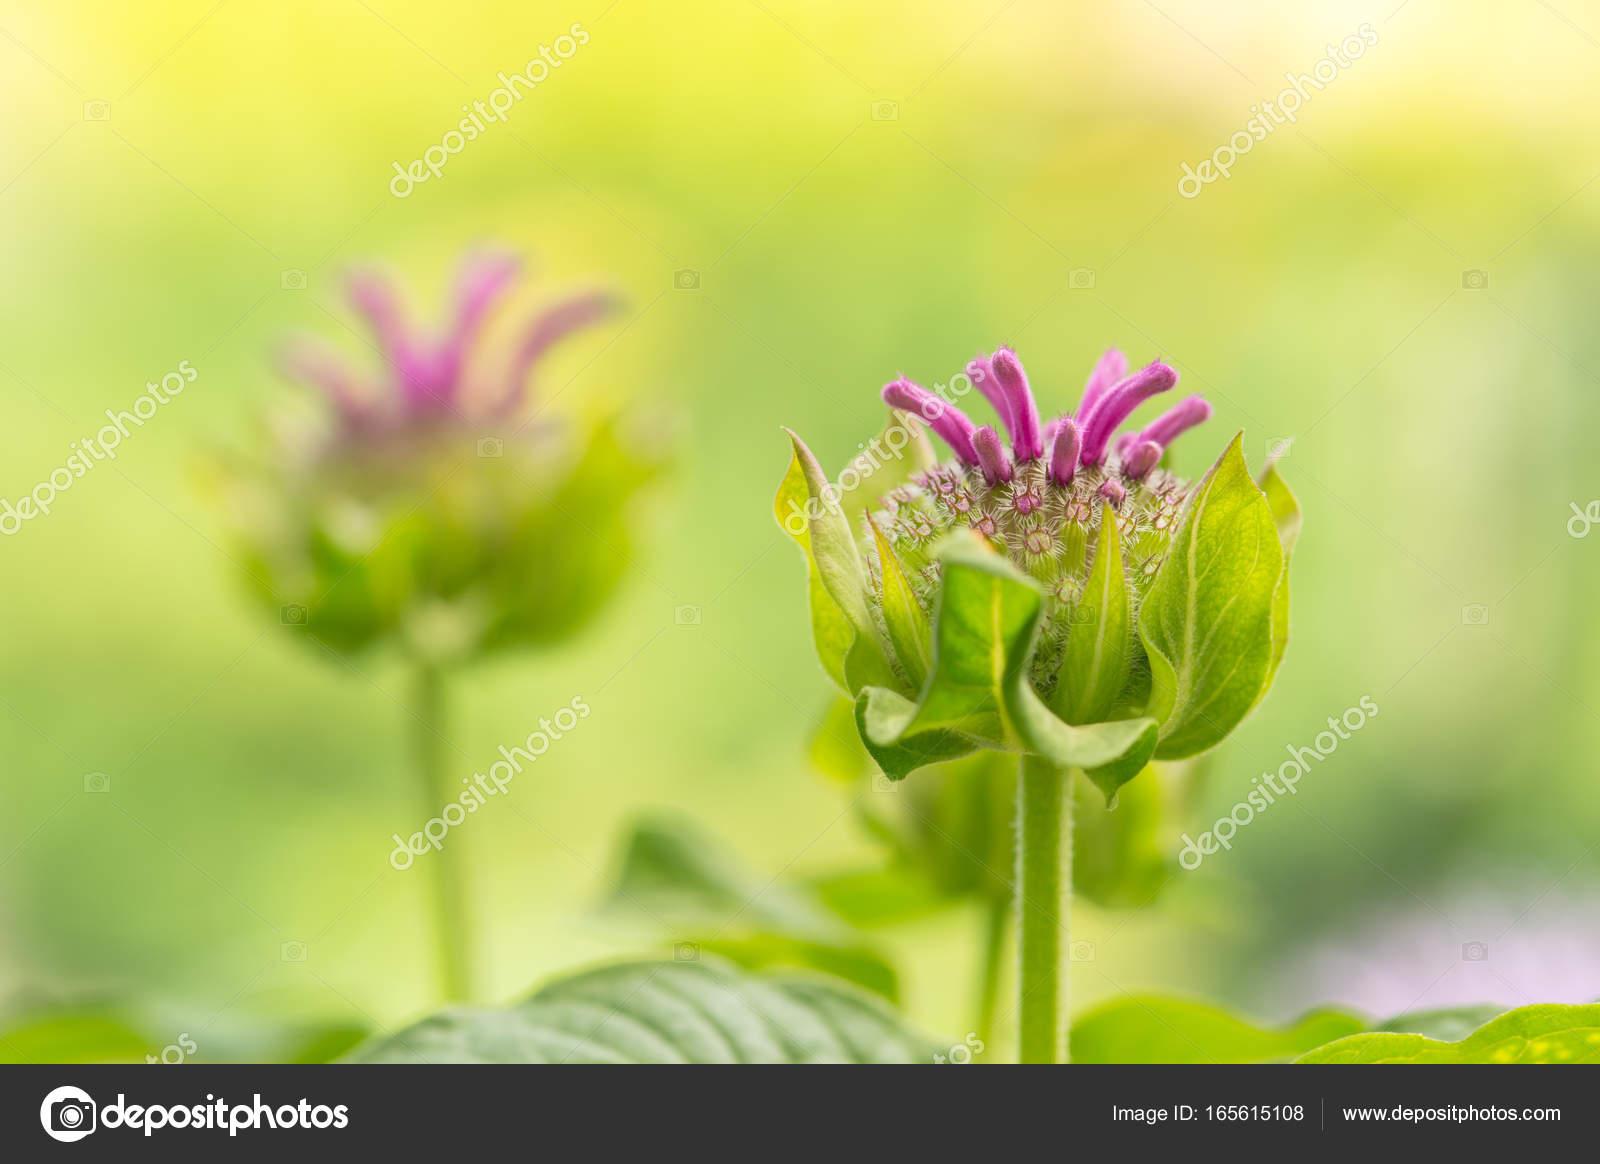 Beautiful unusual pink flowers on a green blurred background beautiful unusual pink flowers on a green blurred background selective soft focus stock photo izmirmasajfo